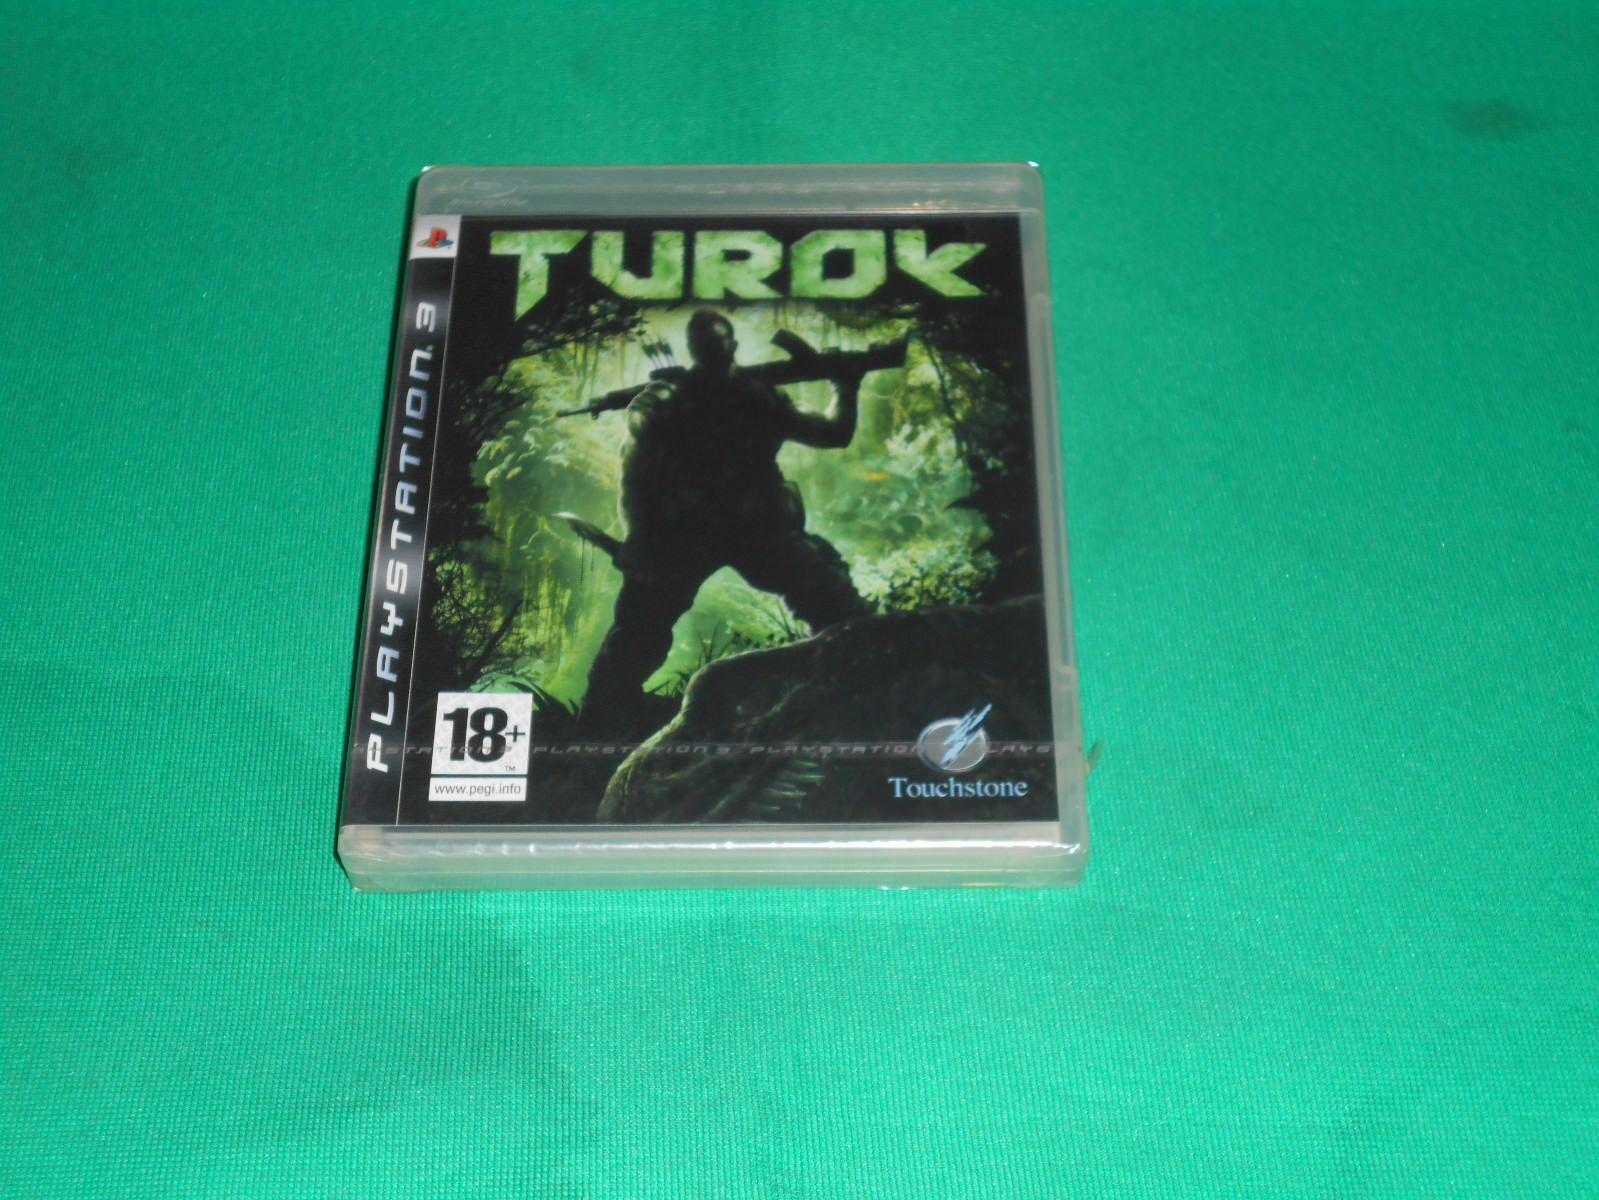 Turok For PLAYSTATION 3 - Disney Interactive